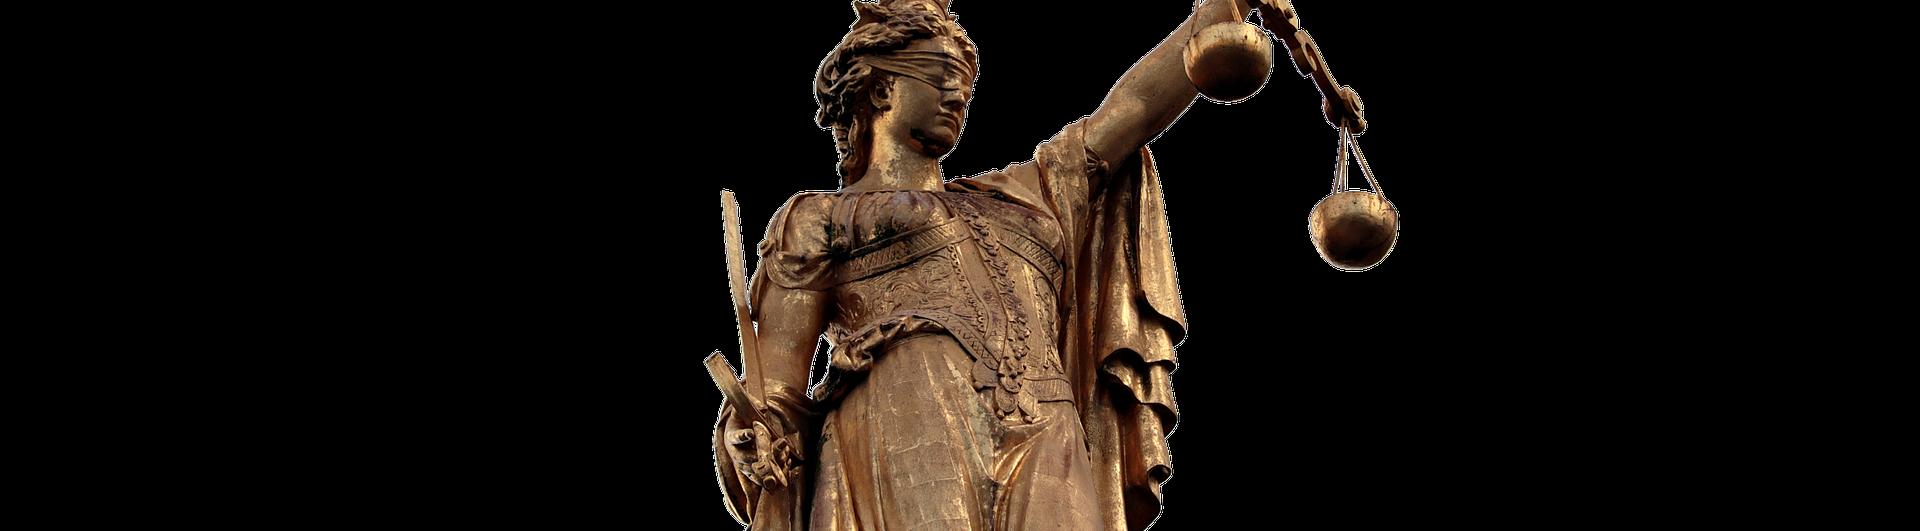 Rechtsanwaltskanzlei · Medecke · Los